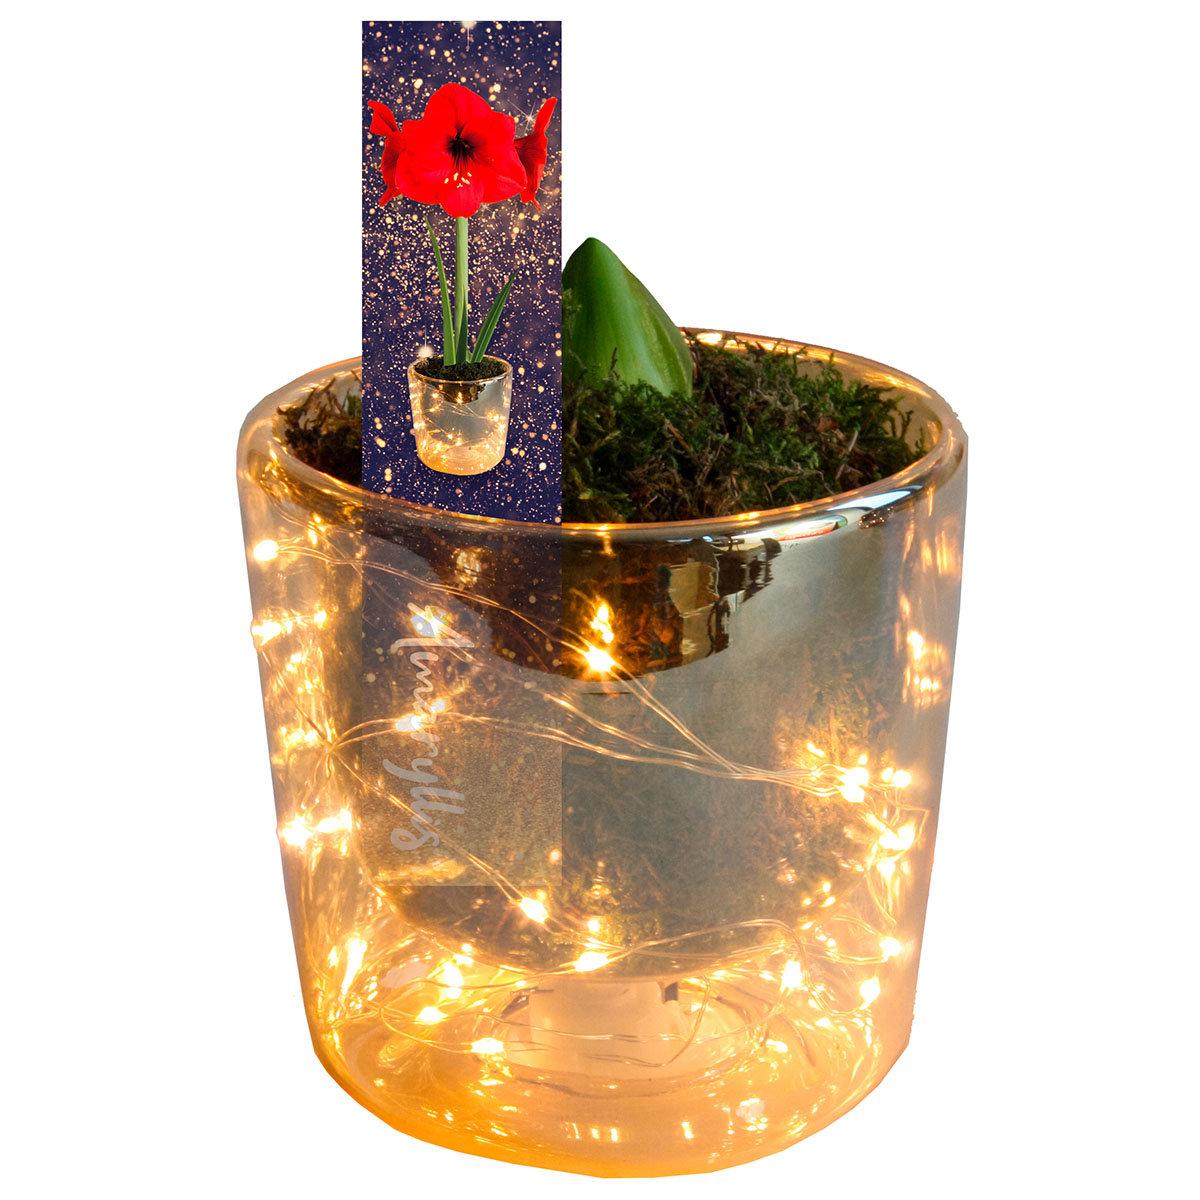 Amaryllis-Set: Amaryllis, Acrylglas-Vase, Moos, LED-Lichterkette, mit Batterien | #2